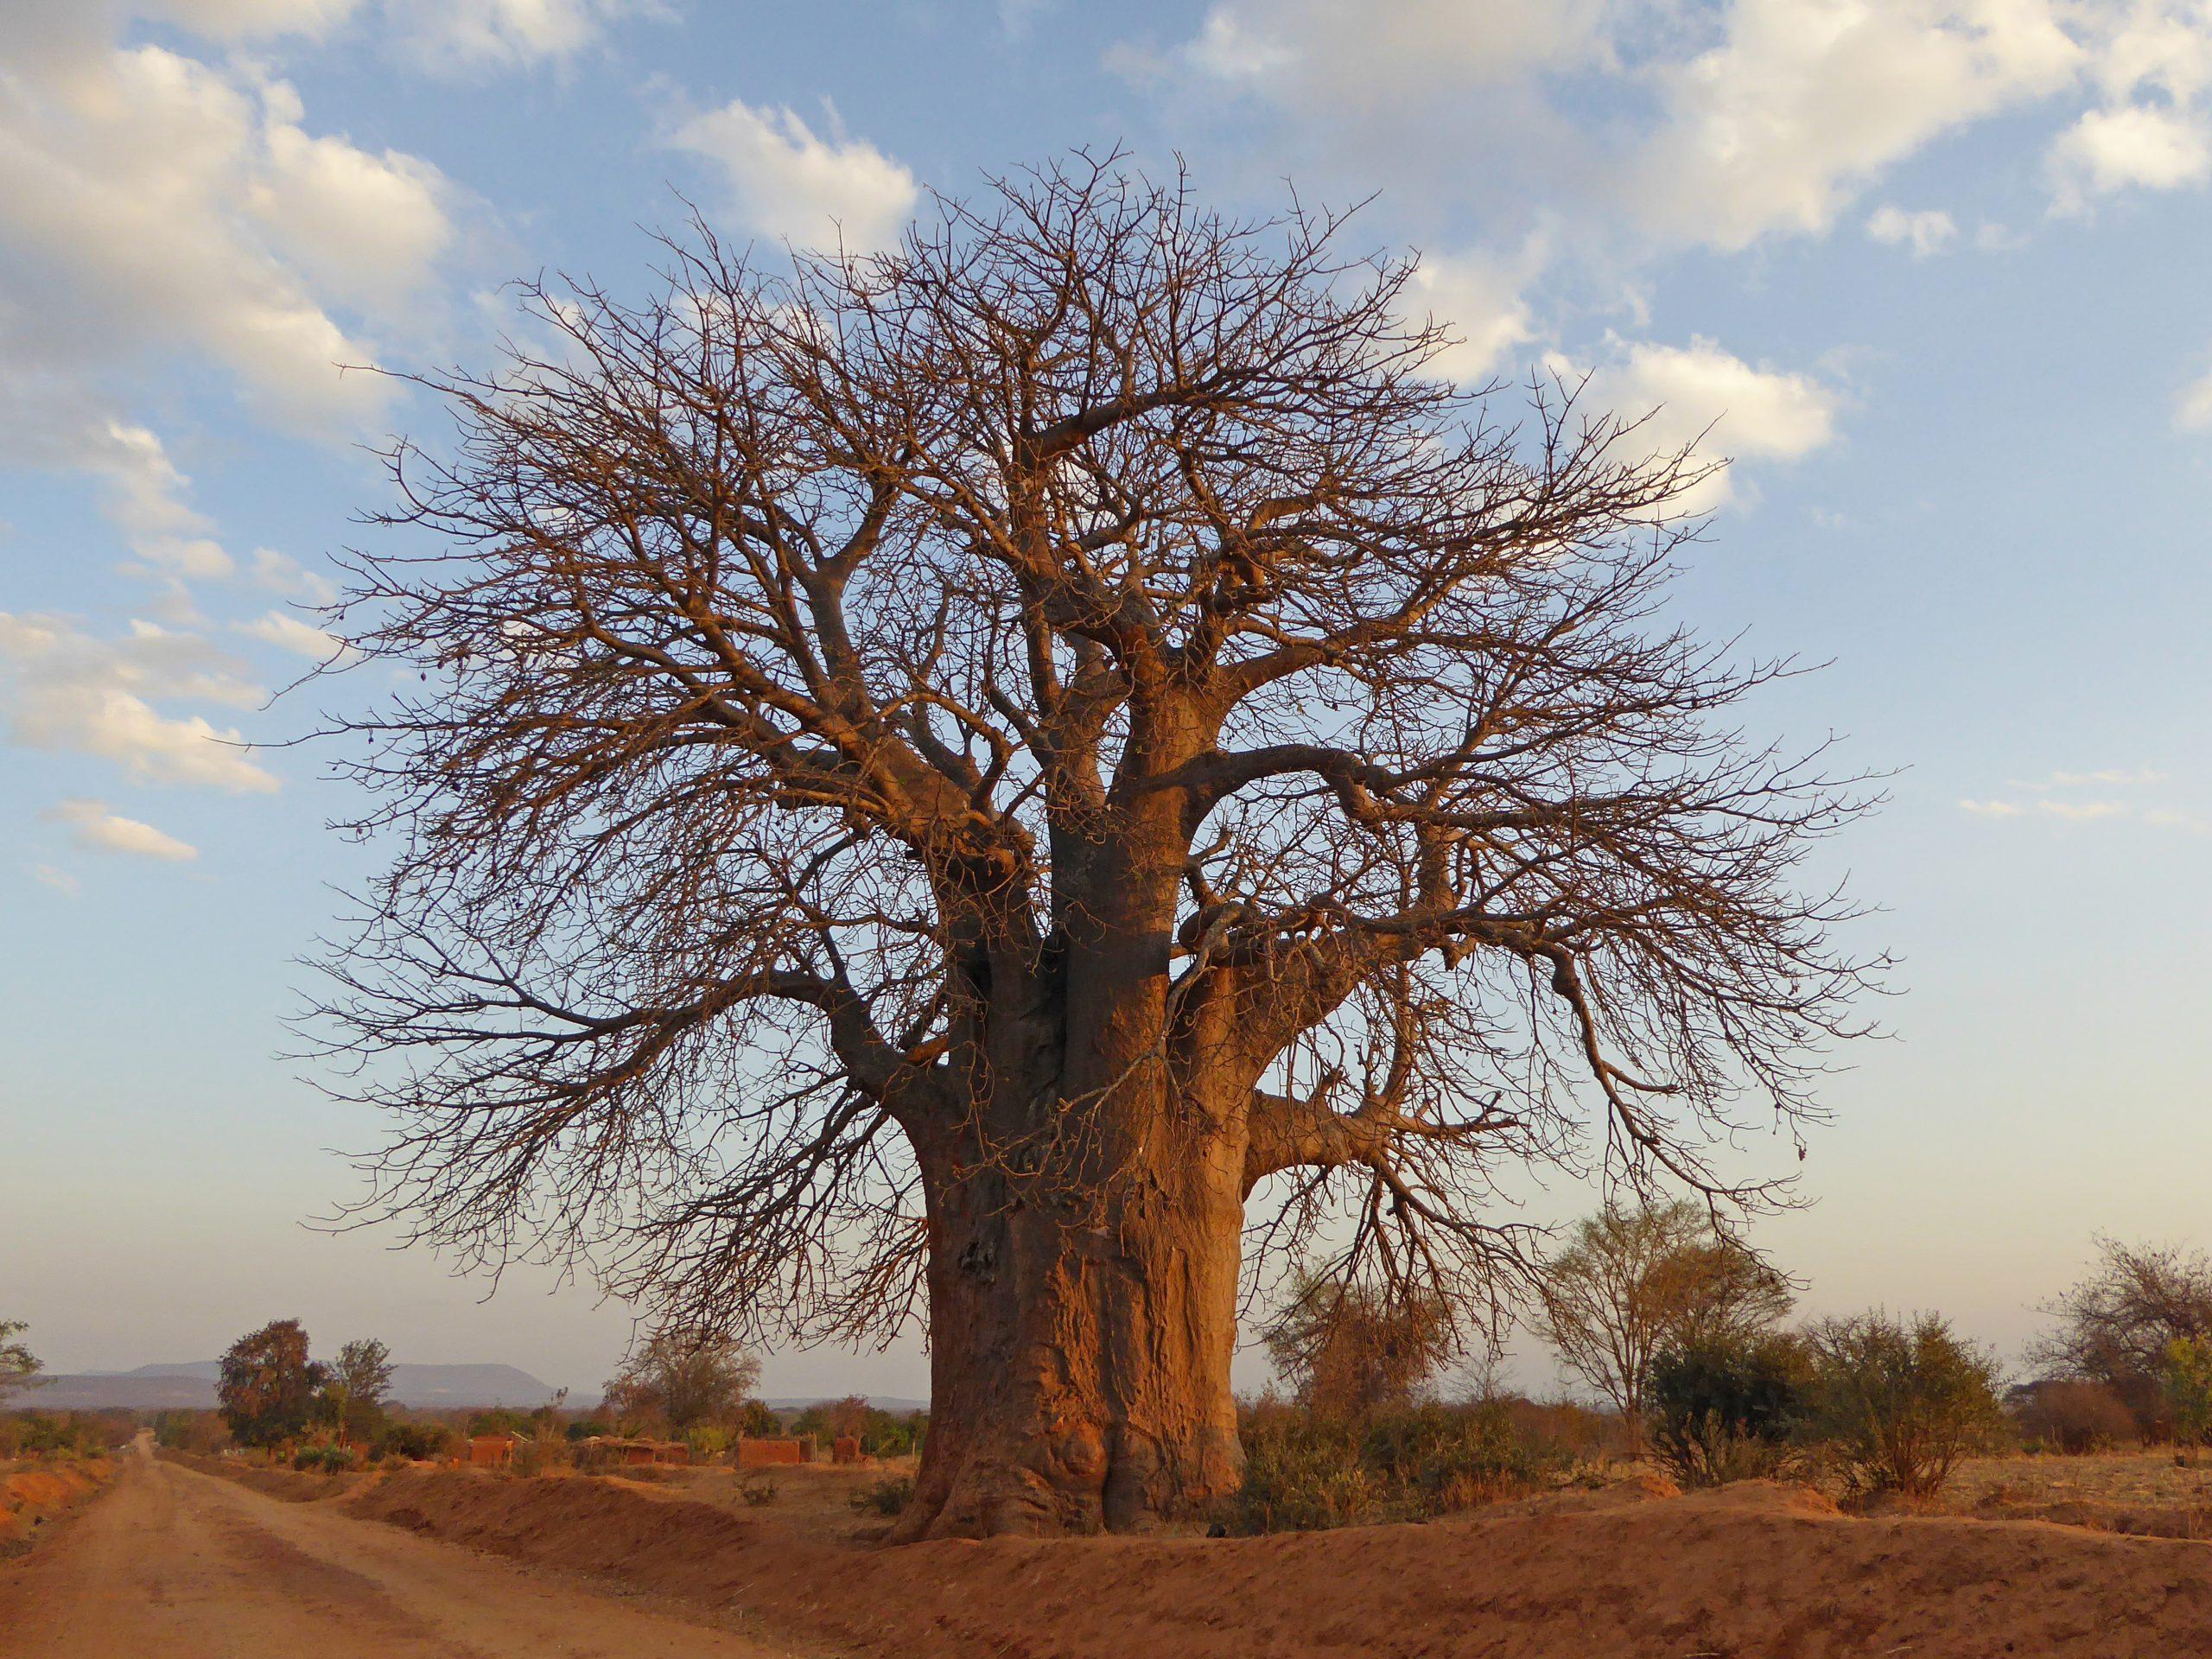 Radreise Afrika 2014 - Affenbrotbaum (Baobab)